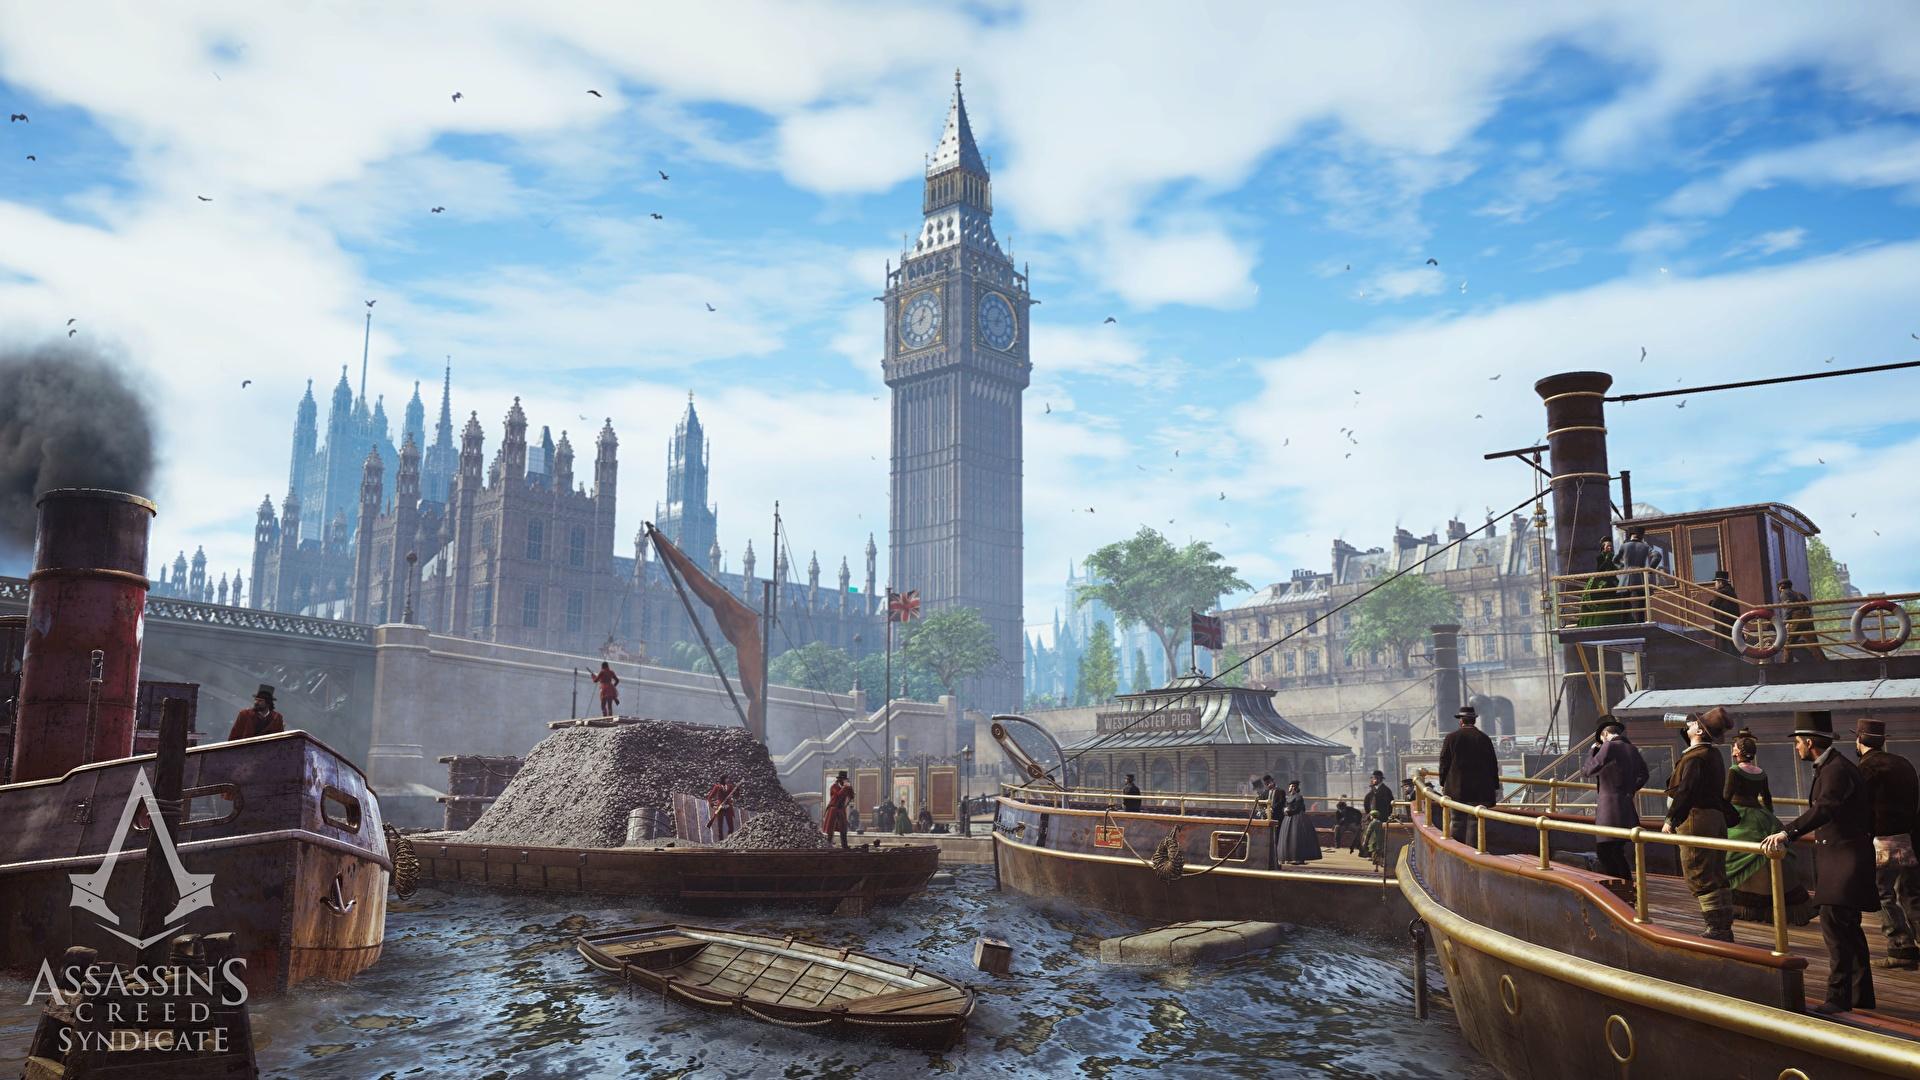 Photos Assassin S Creed Syndicate London Big Ben Games 1920x1080